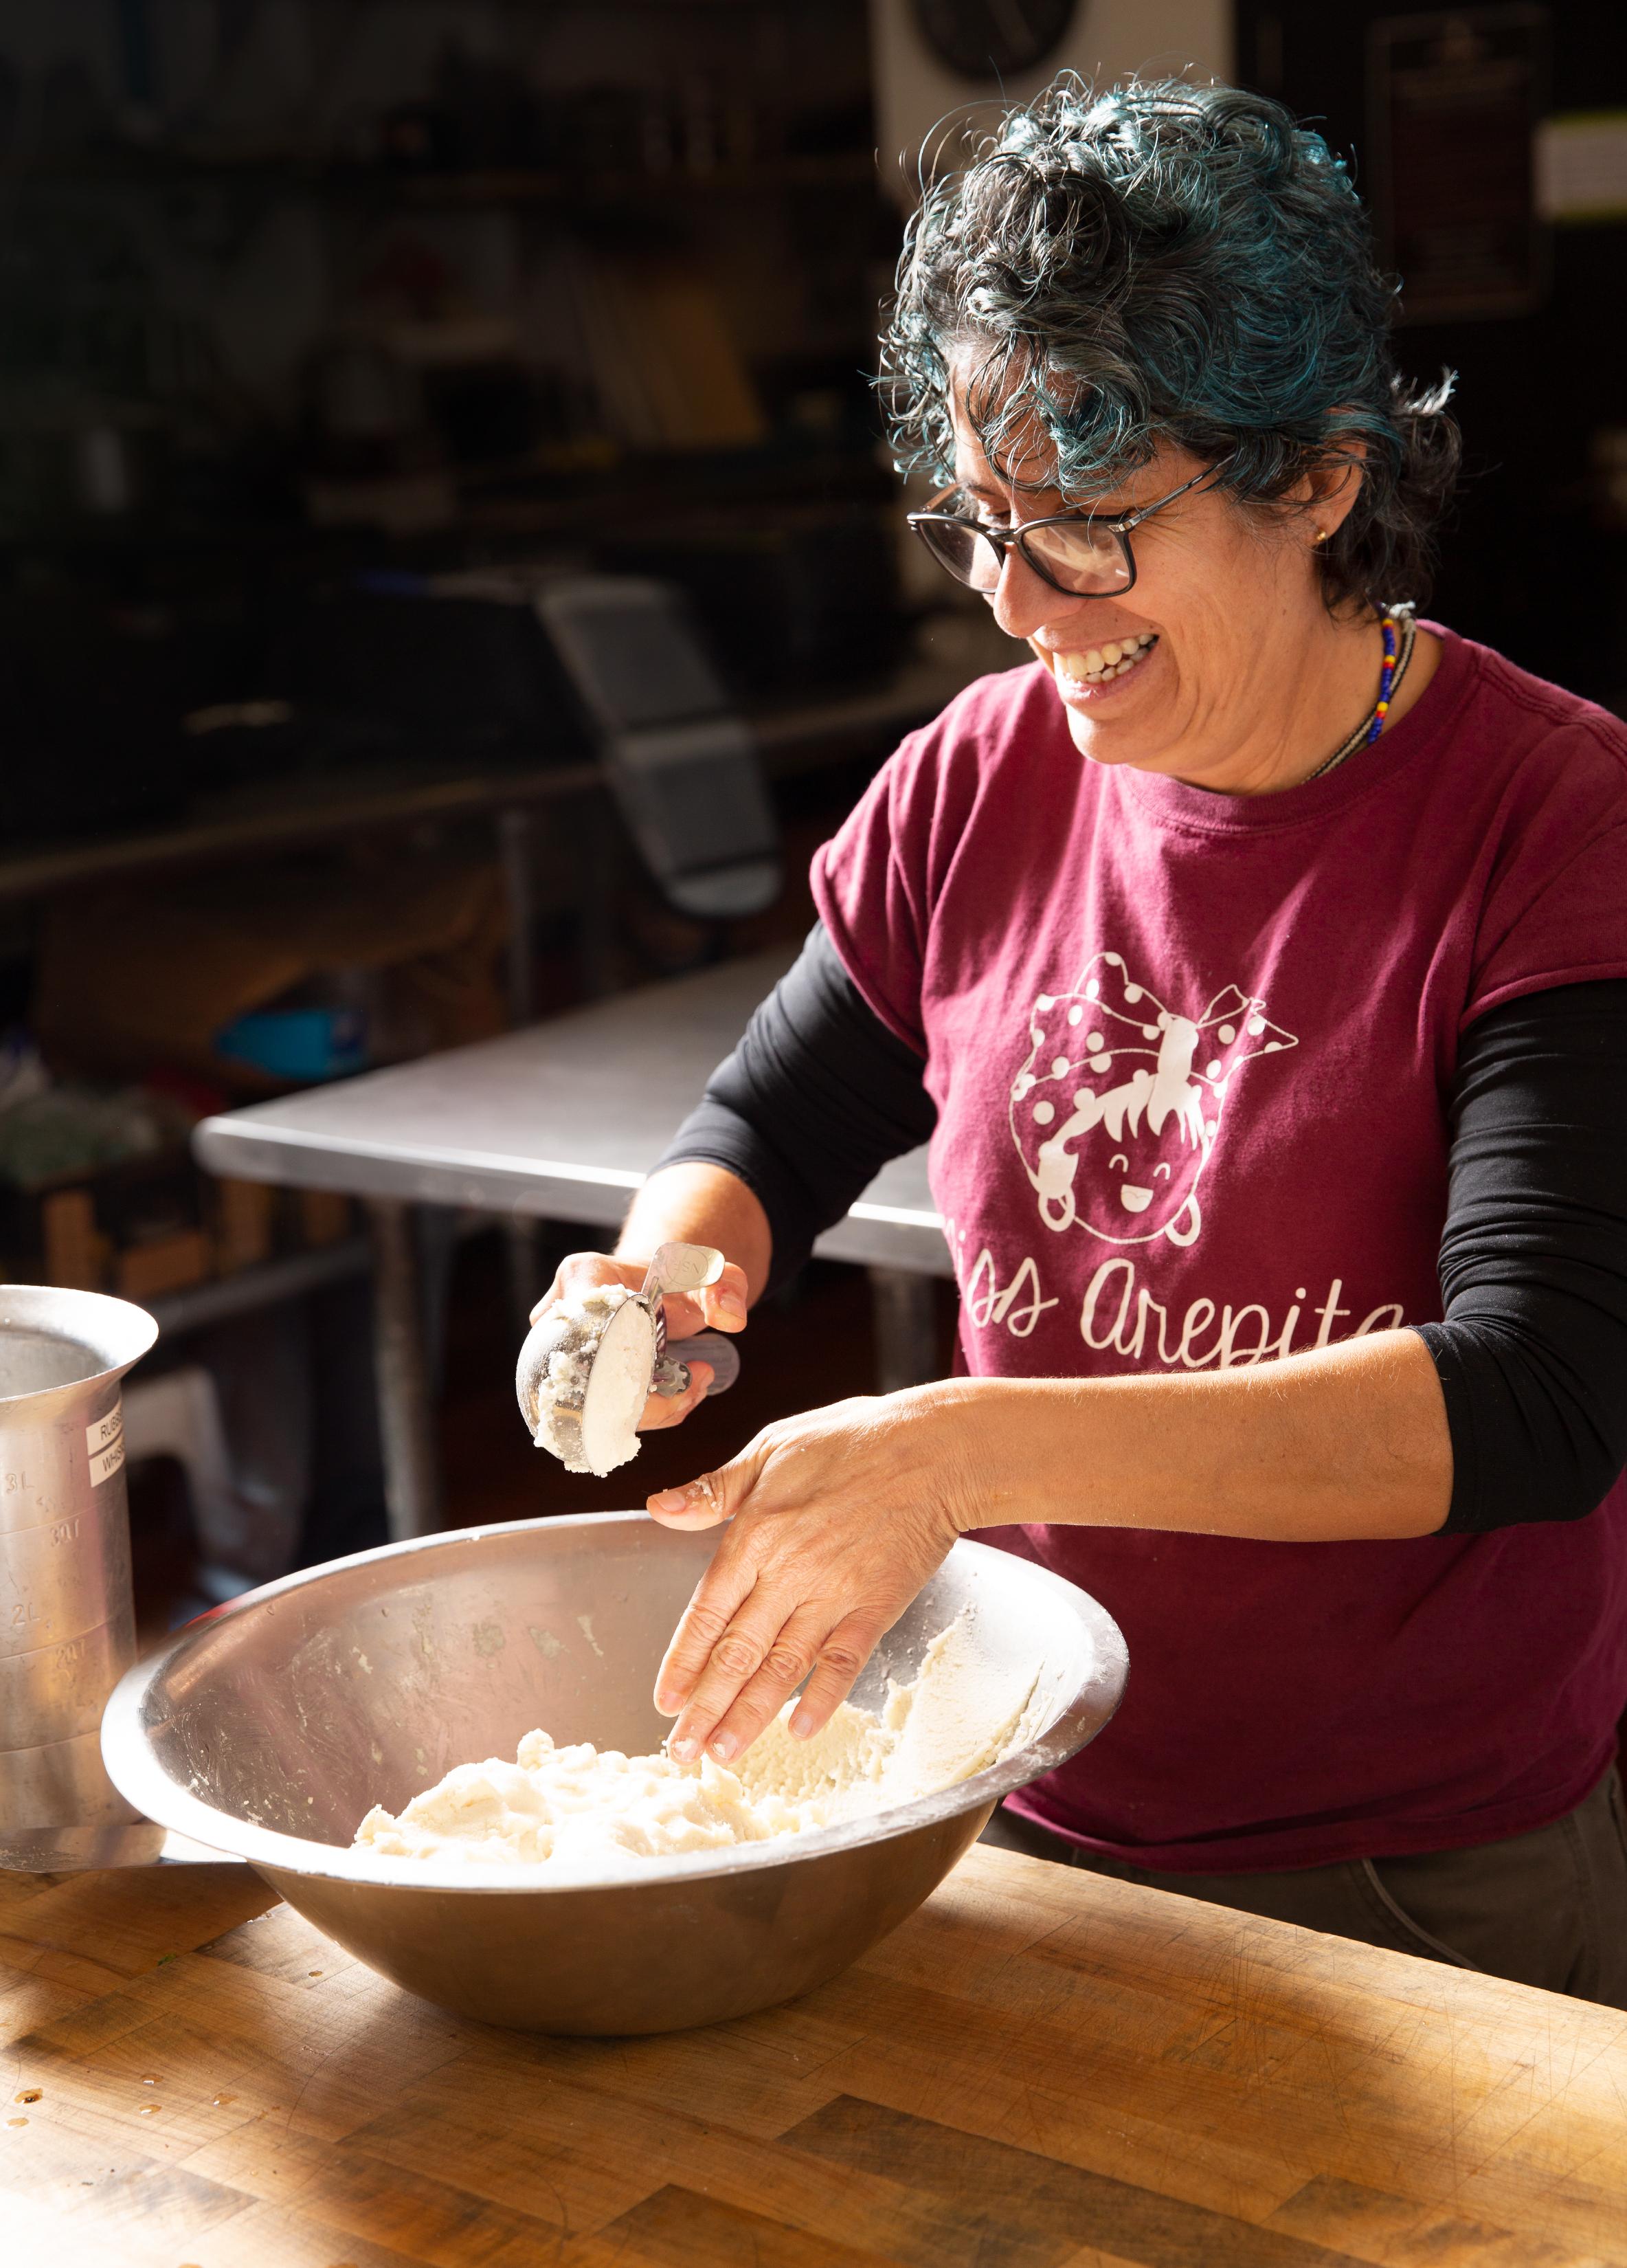 Carolina Abolio in her kitchen preparing for a dinner rush.